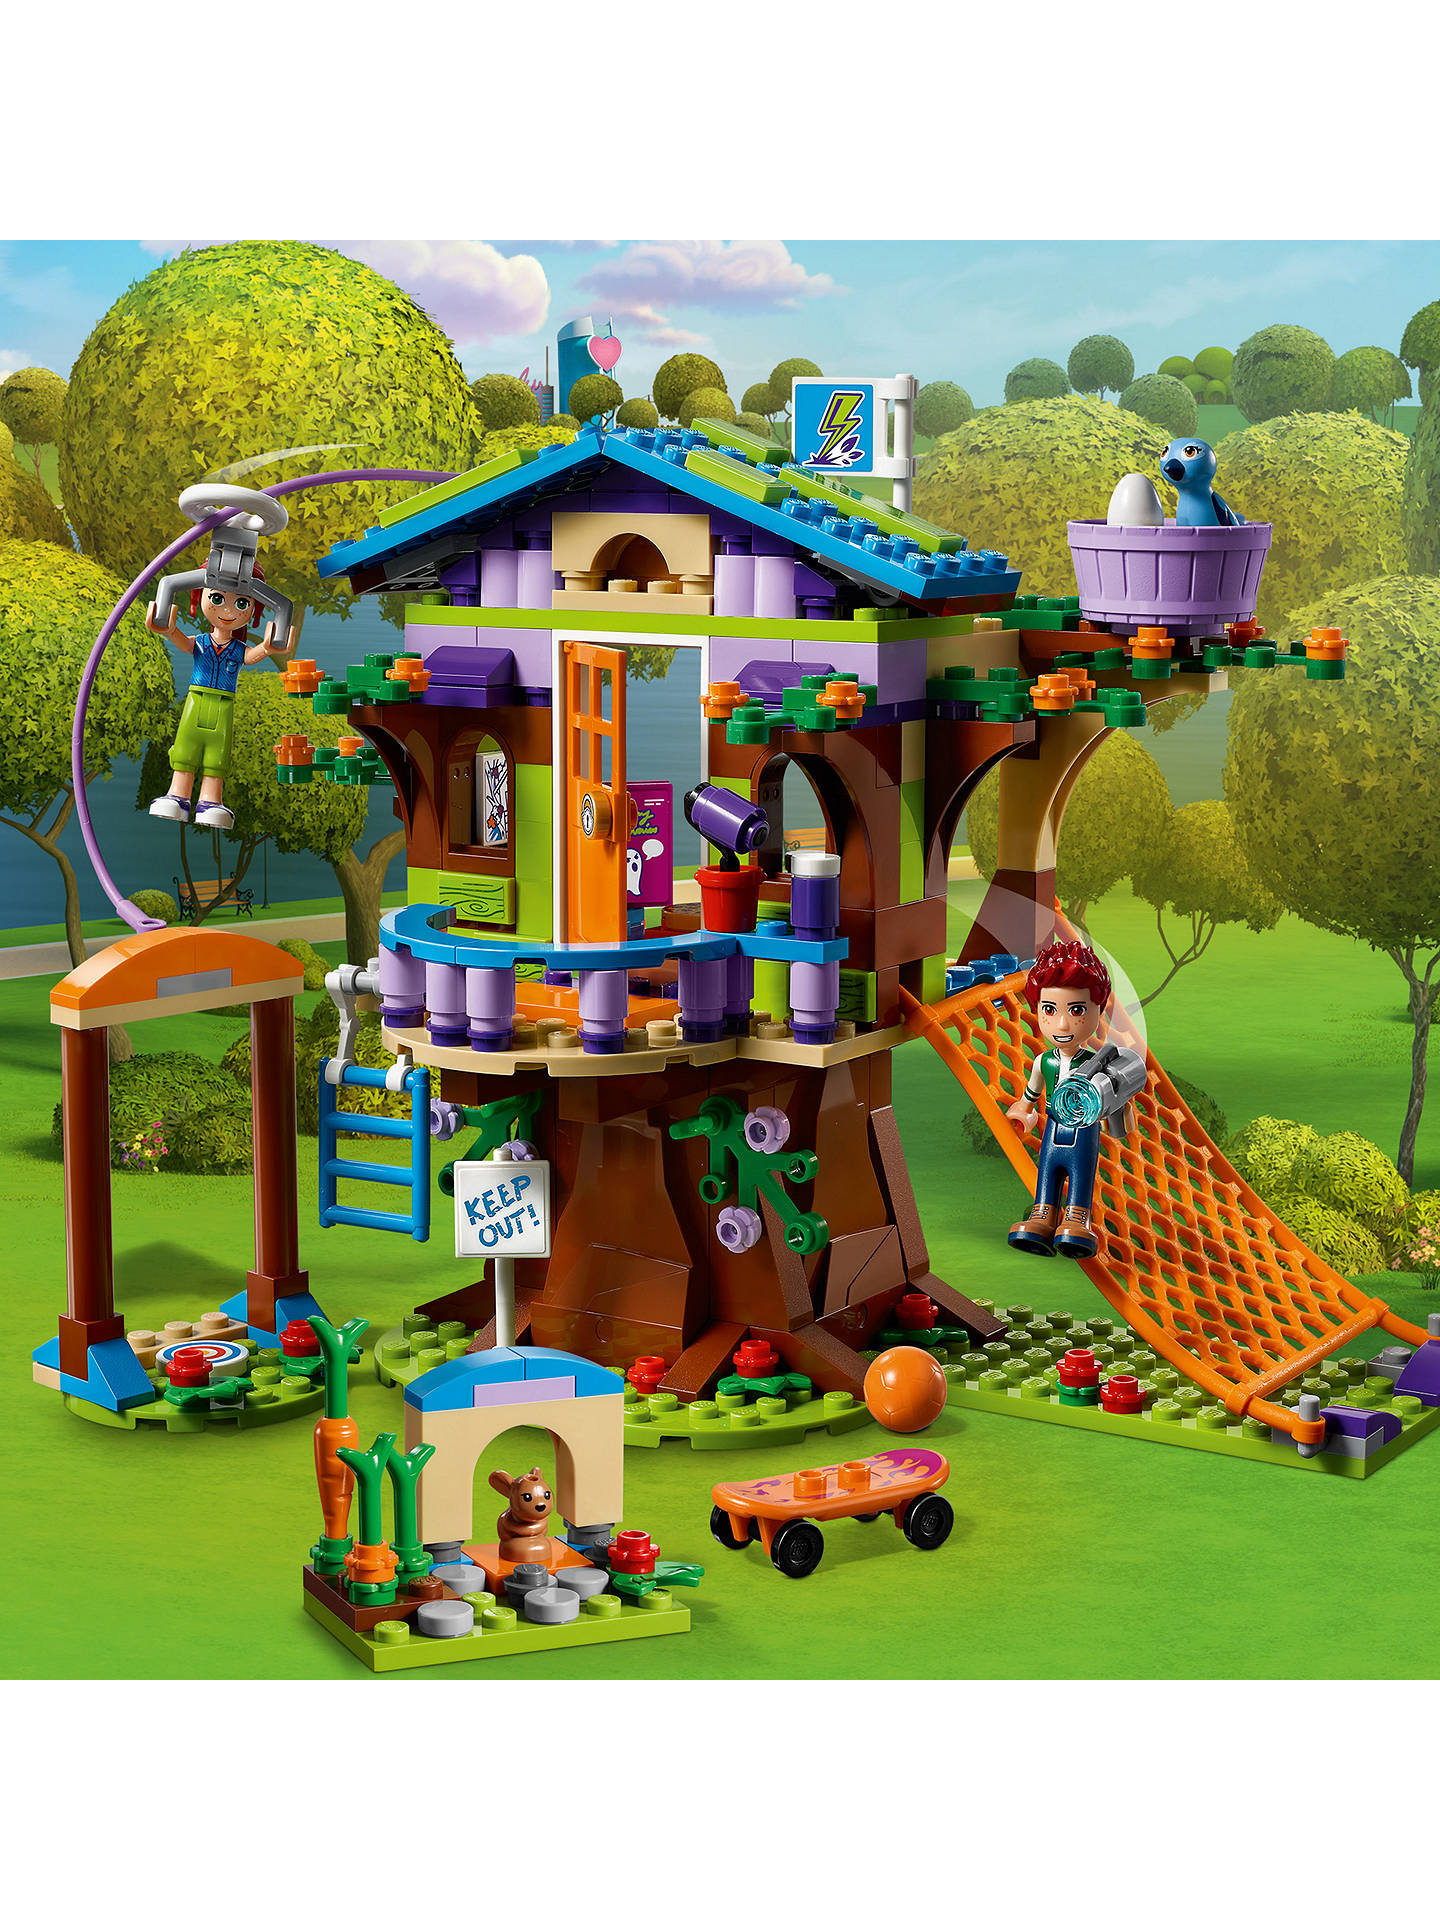 Lego Friends 41335 Heartlake Mias Tree House At John Lewis Partners